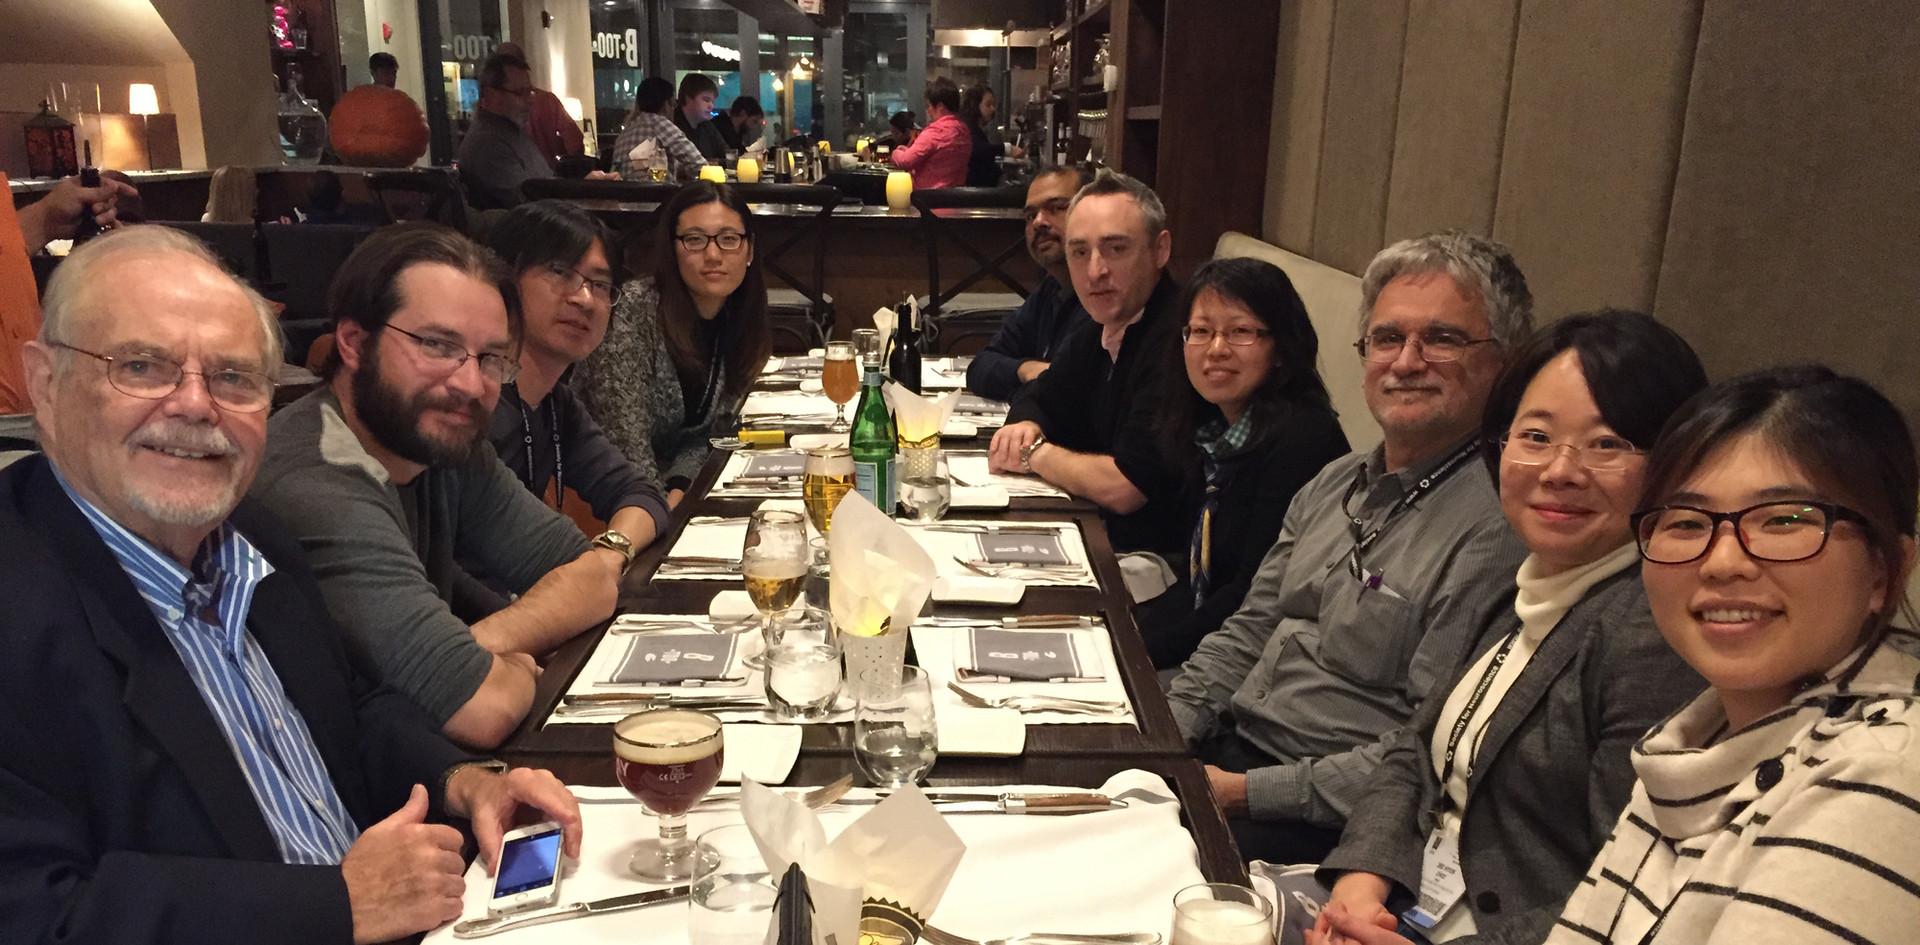 SfN dinner meeting - 2014 Fall